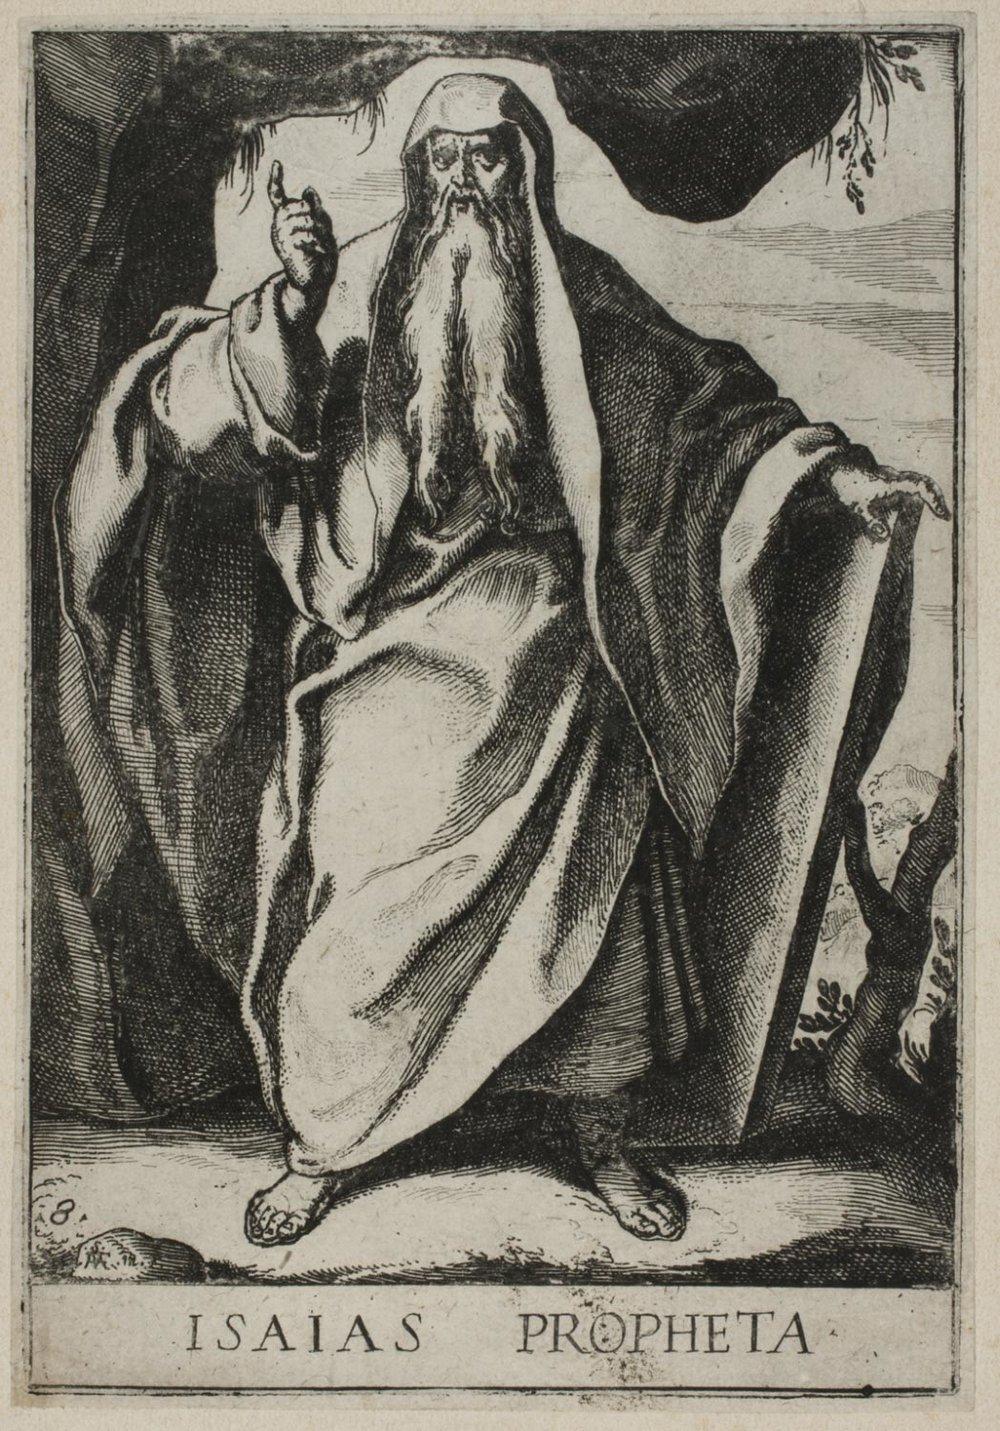 Isaiah  , 1609, by Raffaello Schiaminossi, Italian from the  Philadelphia Museum of Art